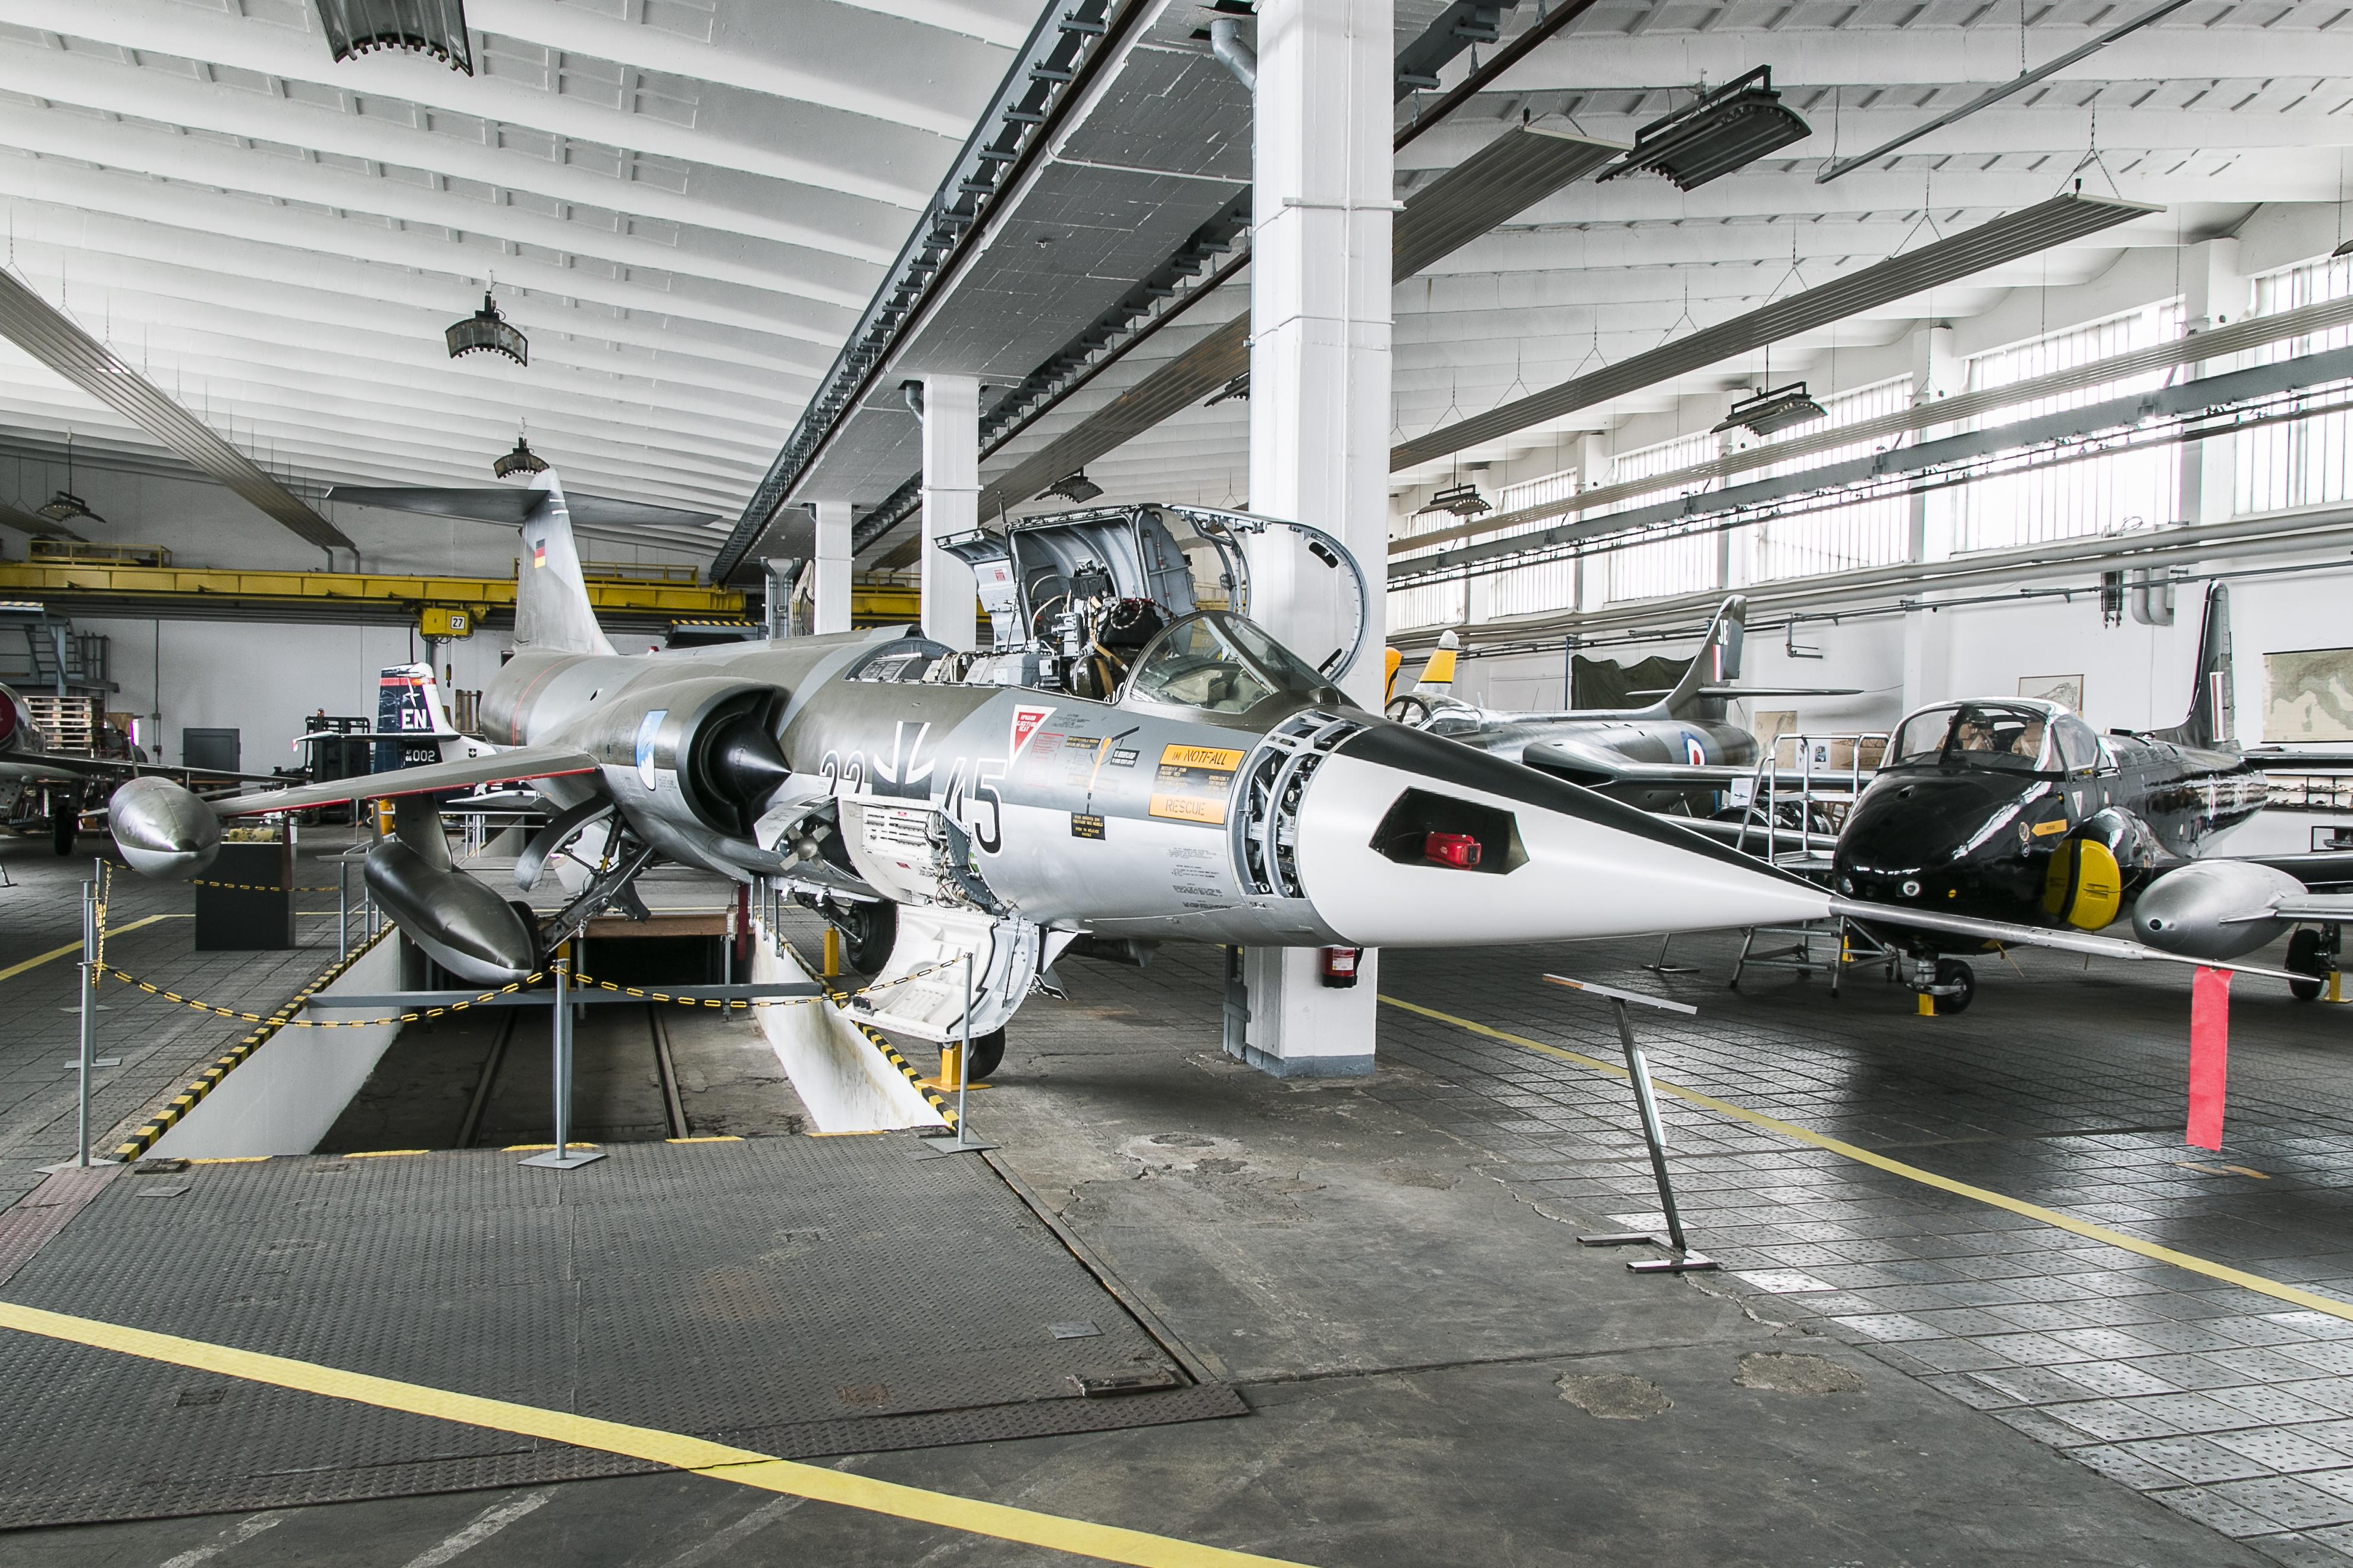 Hangar 4, Starfighter F-104